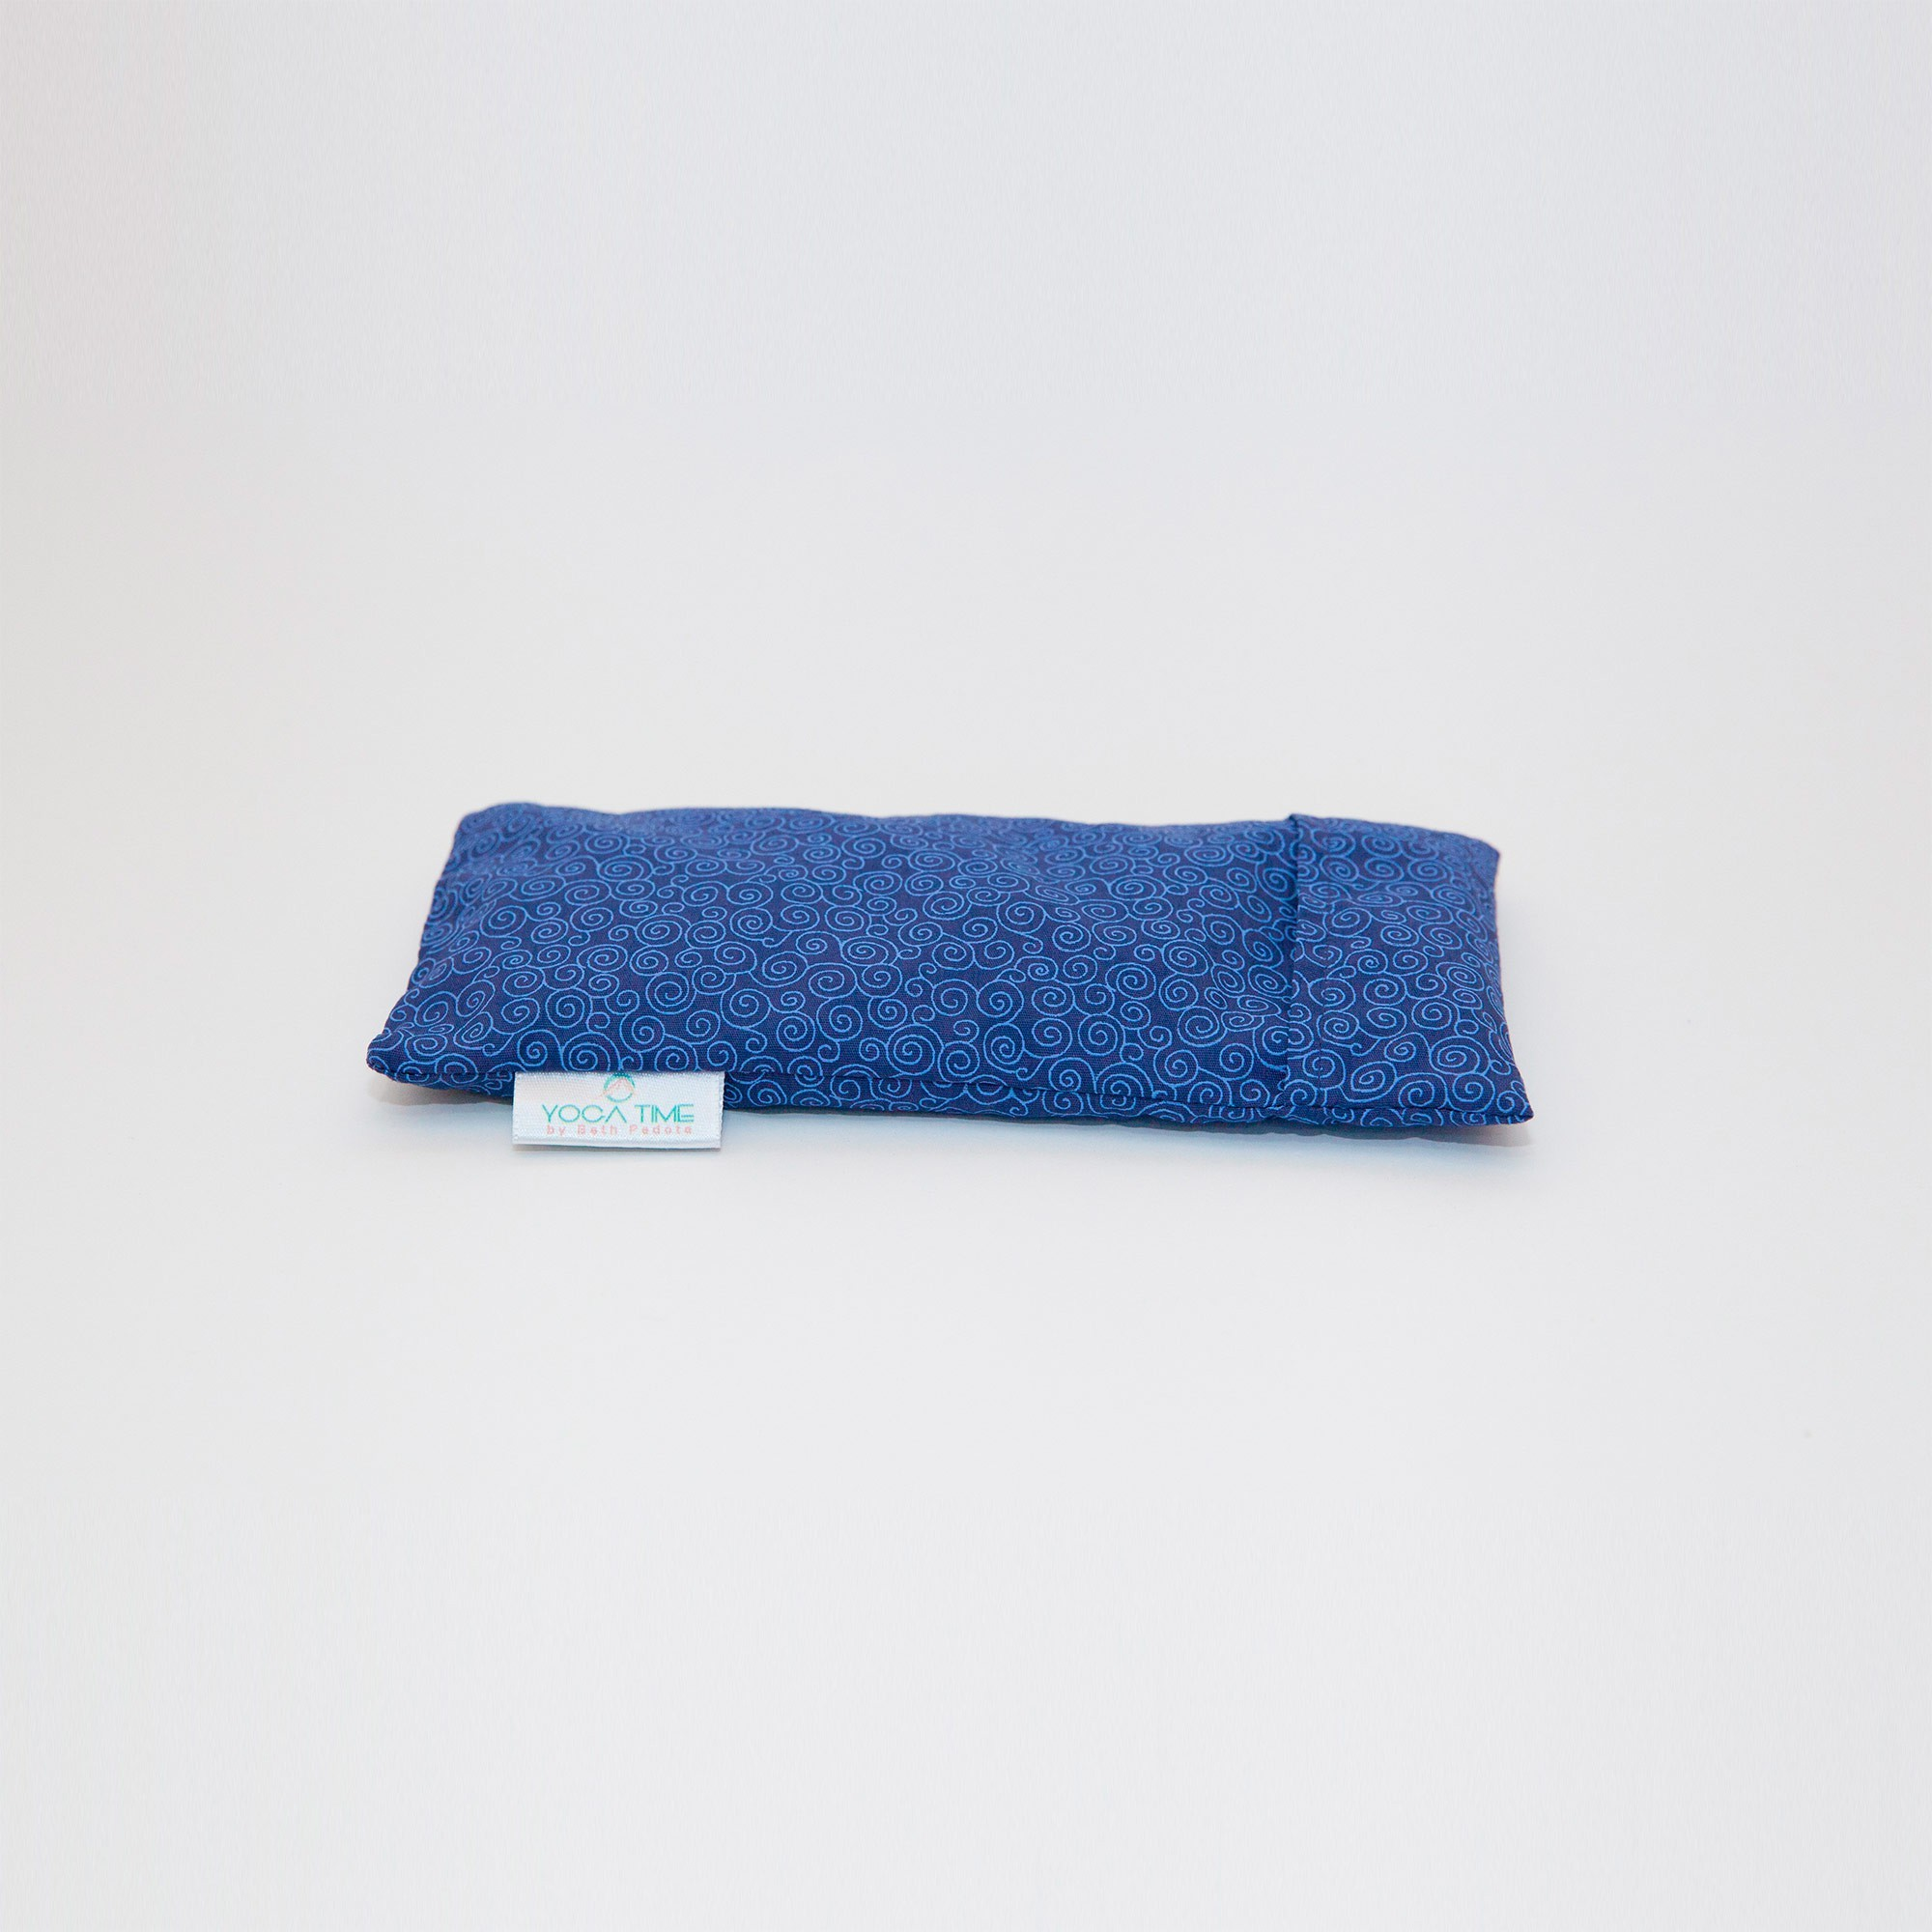 Kit Natal Relax Facial Sabonete líquido Facial  Vegano Natural + Almofada Térmica Eye Pillow Azul anil caracóis